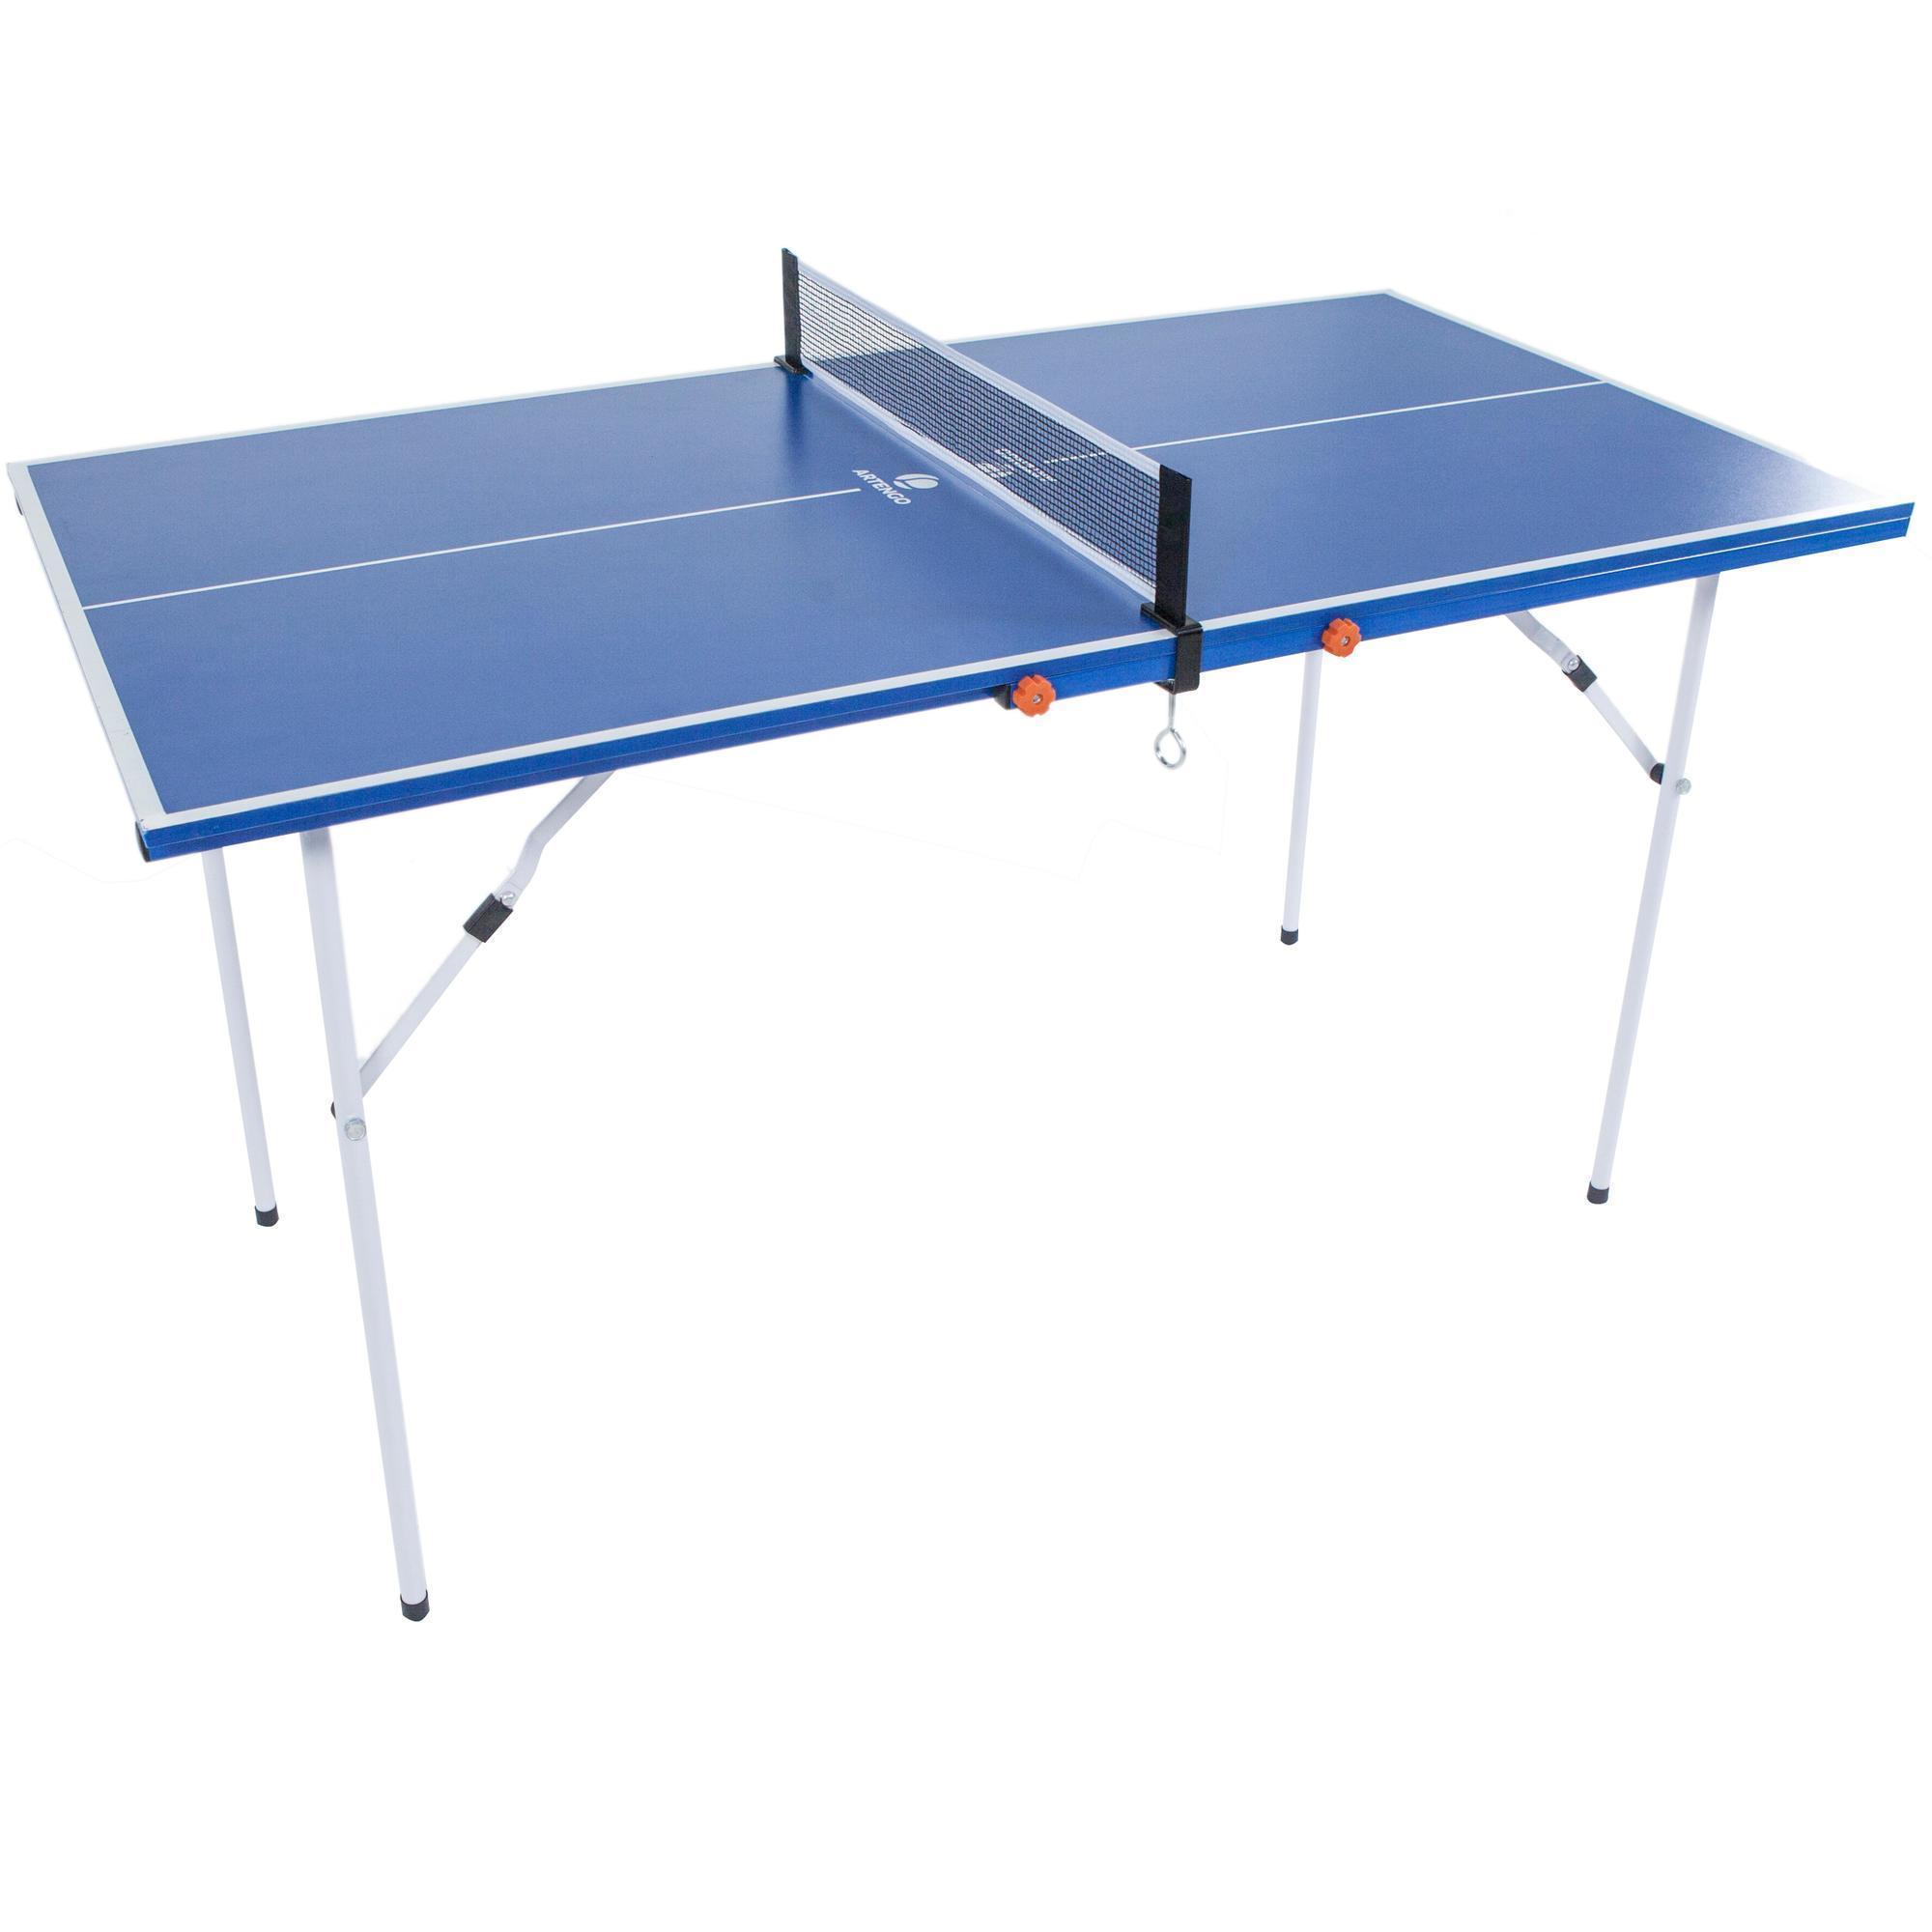 Tavolo ping pong ft mini artengo - Tavolo da ping pong decathlon prezzi ...